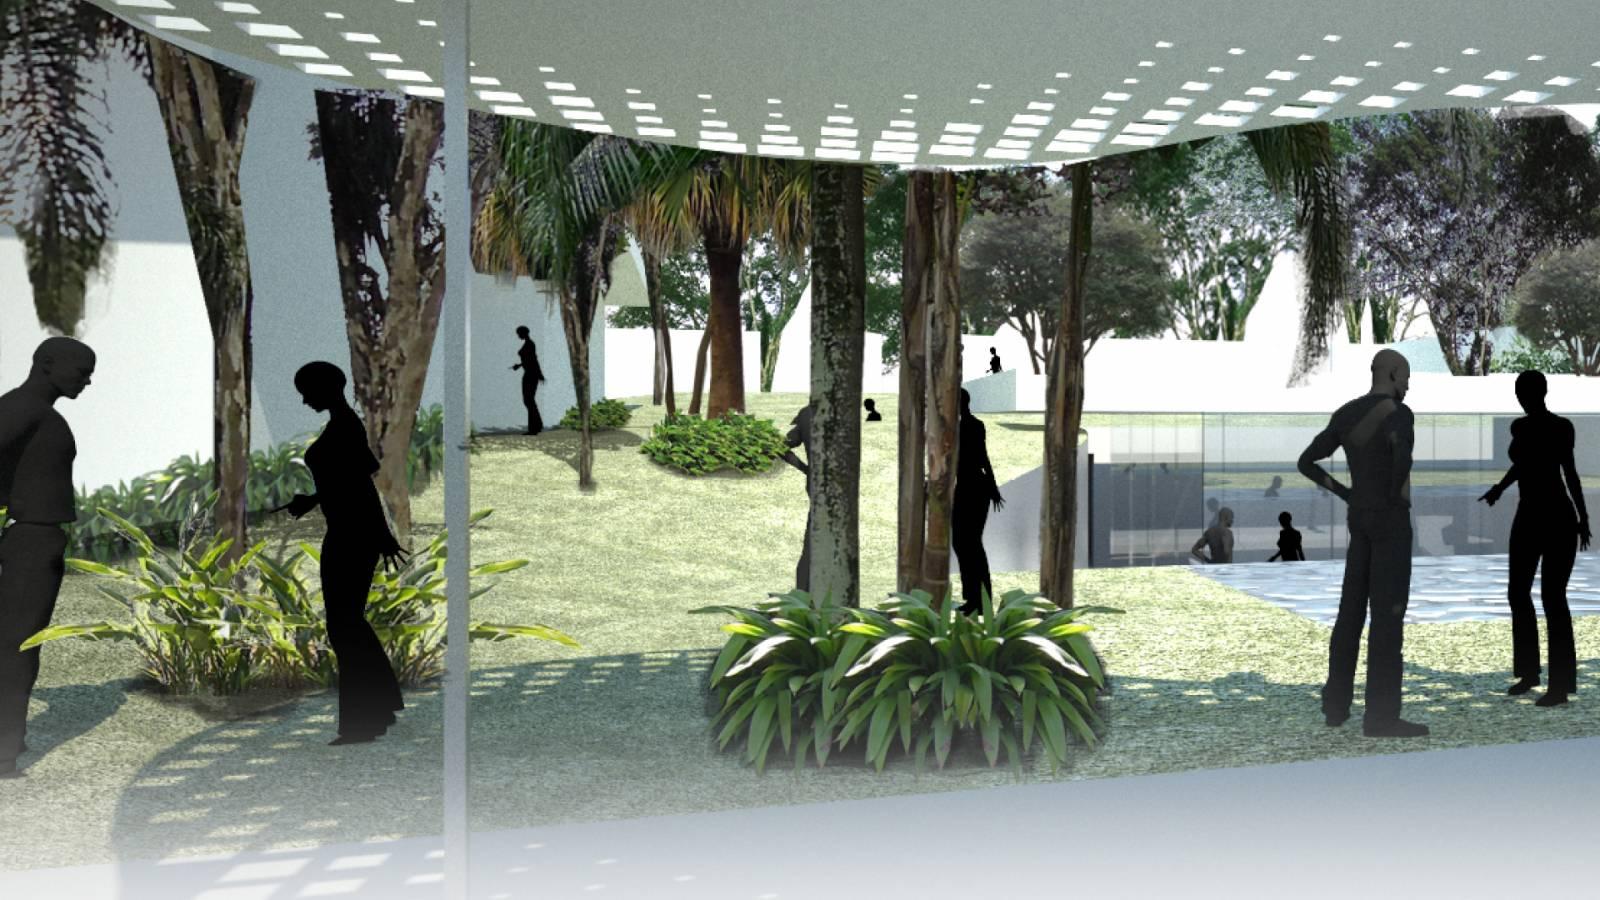 UNDER CANOPY - São Paulo Art Pavillion - SPOL Architects